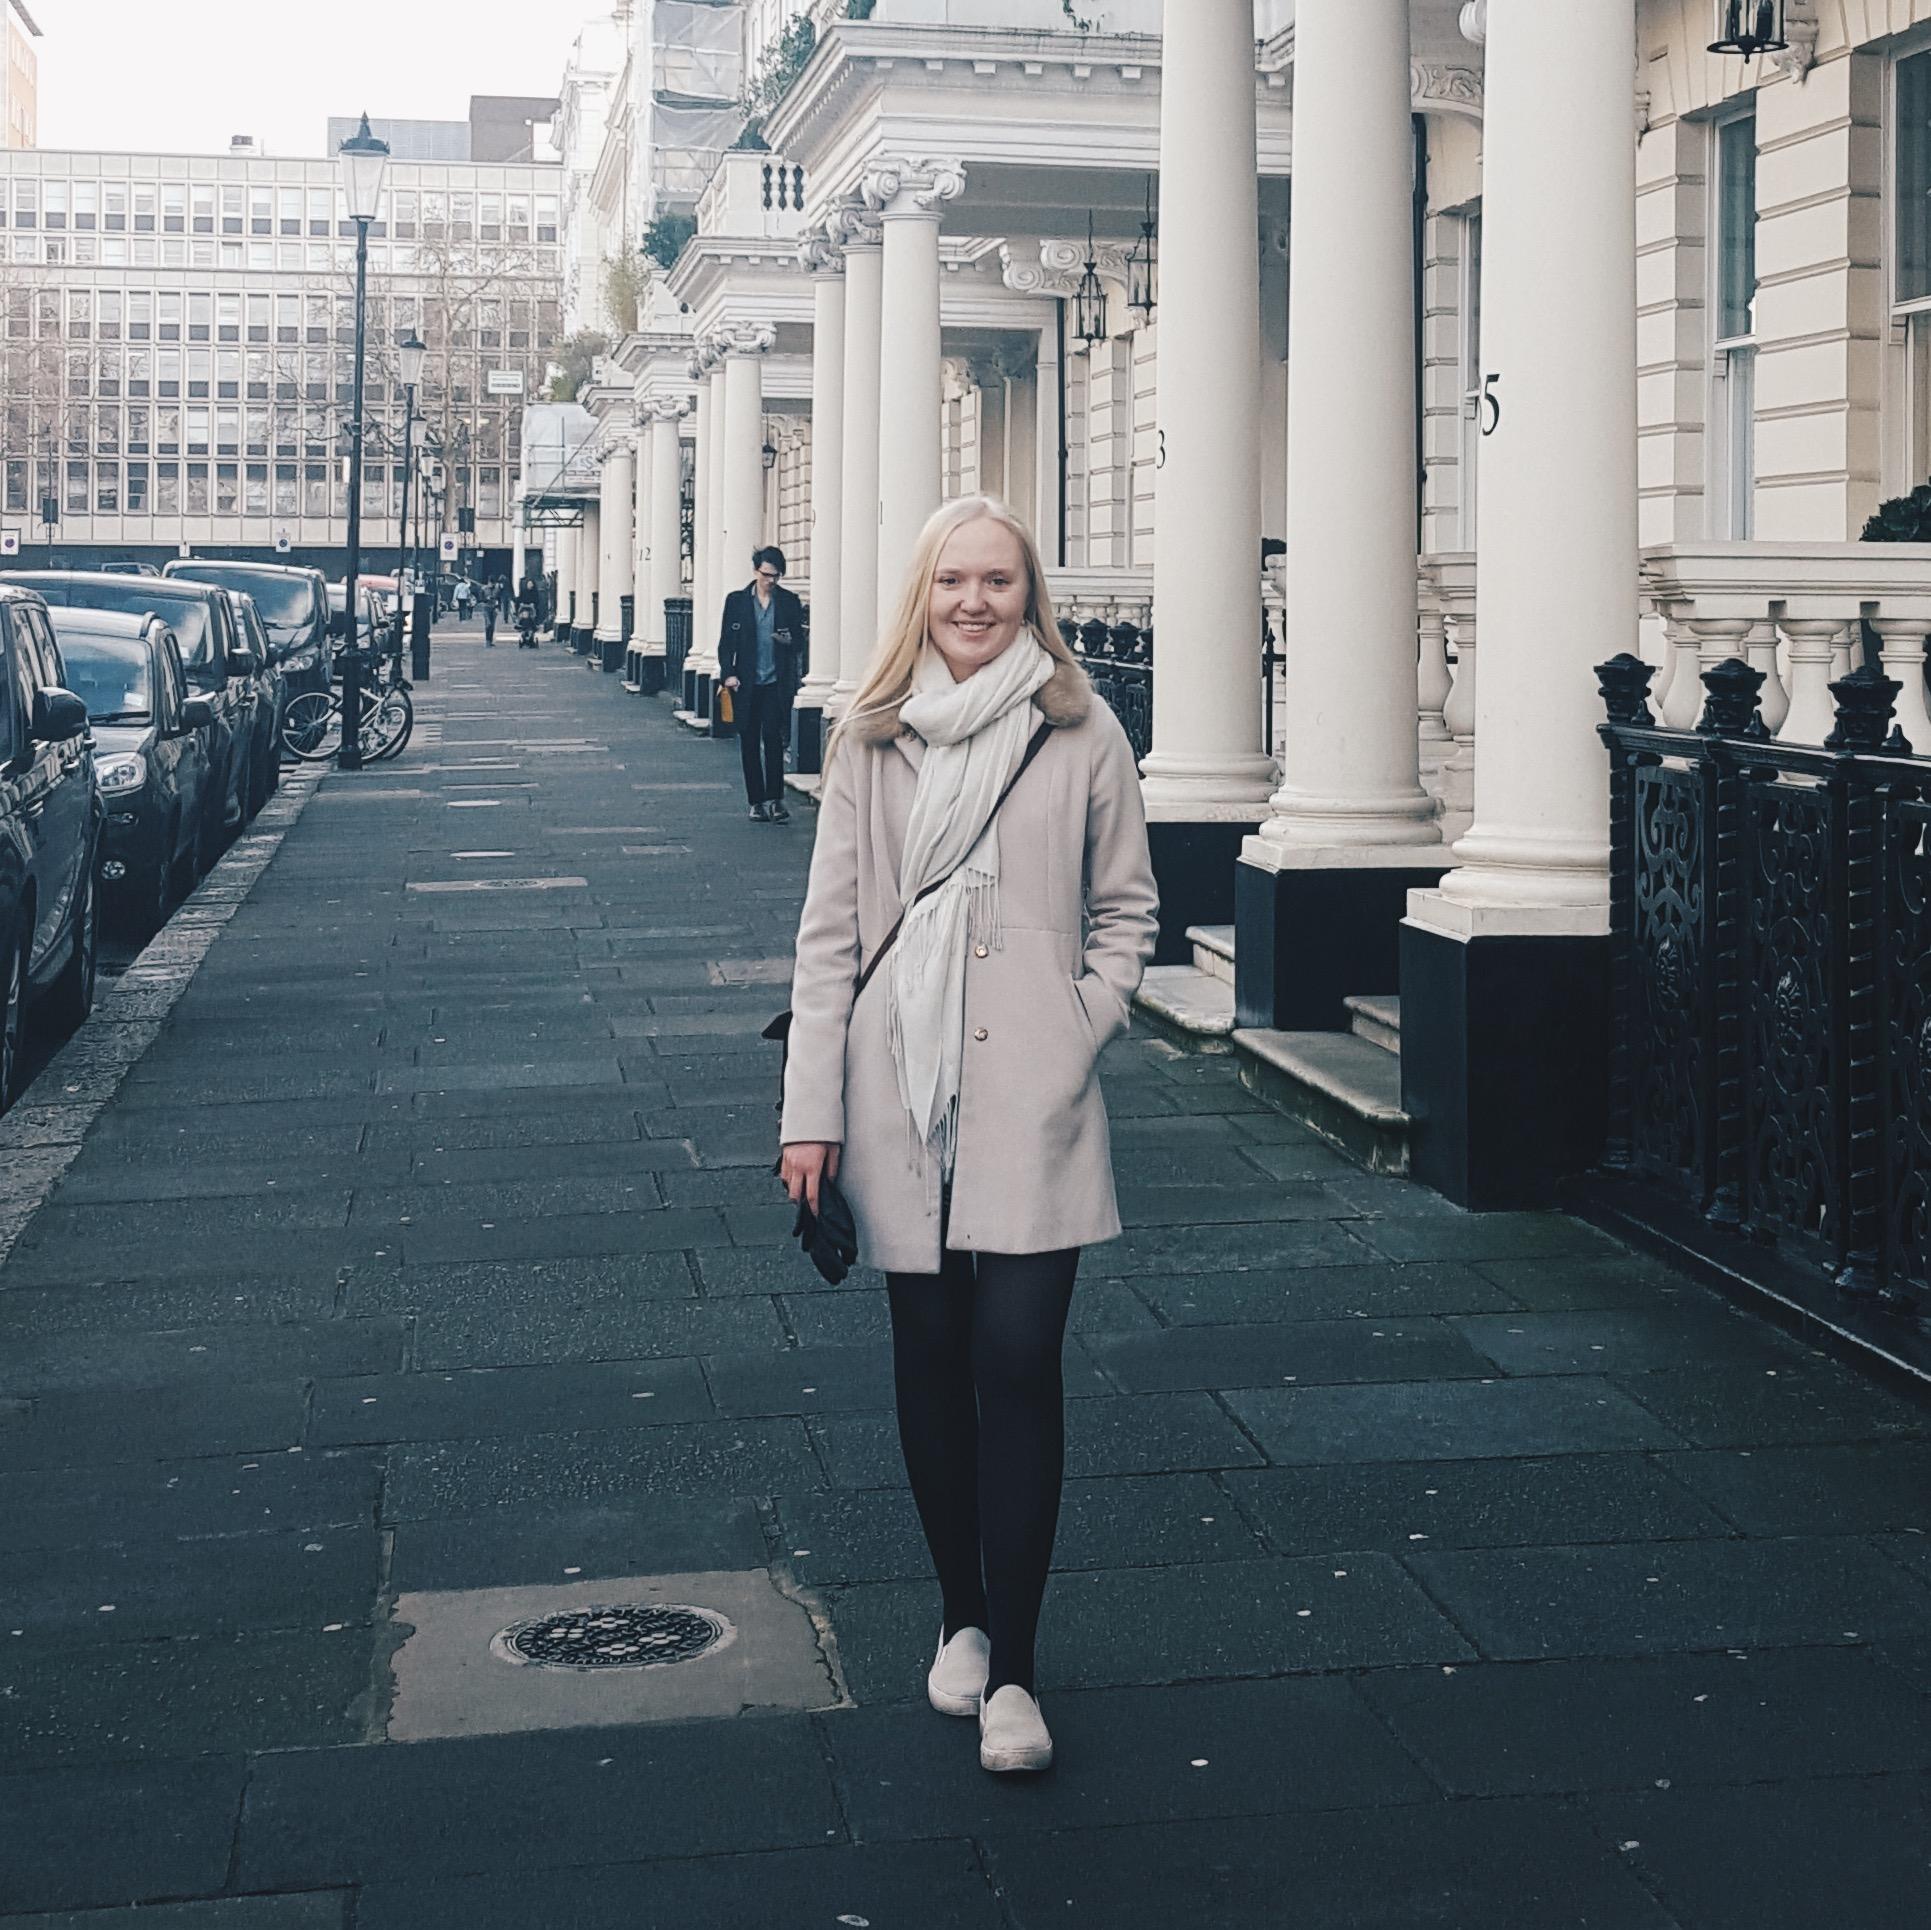 Tosca Marmefelt, deltagare i Rays 2015, har blivit antagen till Imperial College i London!